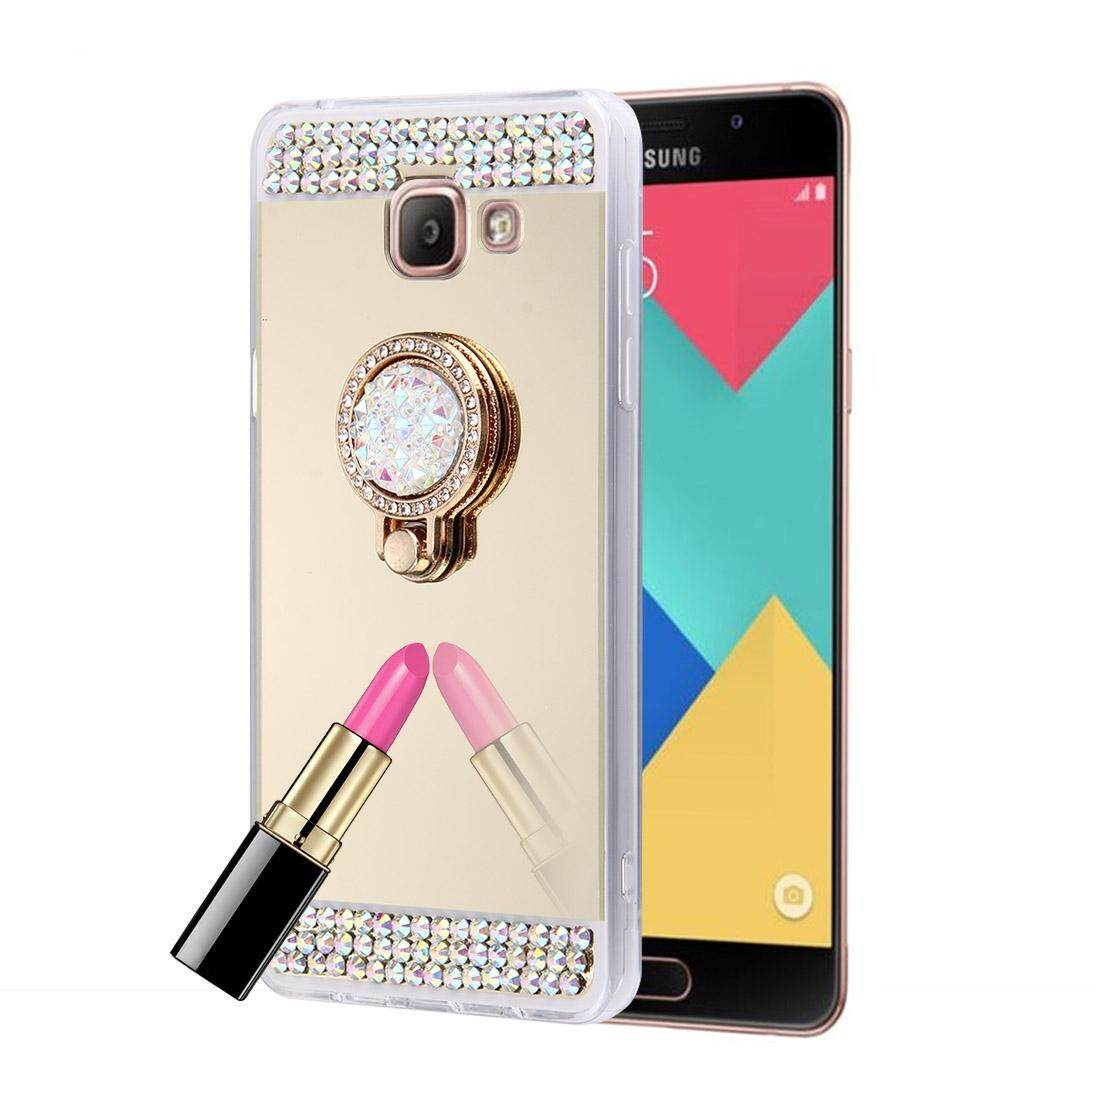 Cek Harga Baru For Samsung Galaxy A5 2016 A510 Diamond Encrusted Original Clear Cover Casing Electroplating Mirror Protective Case